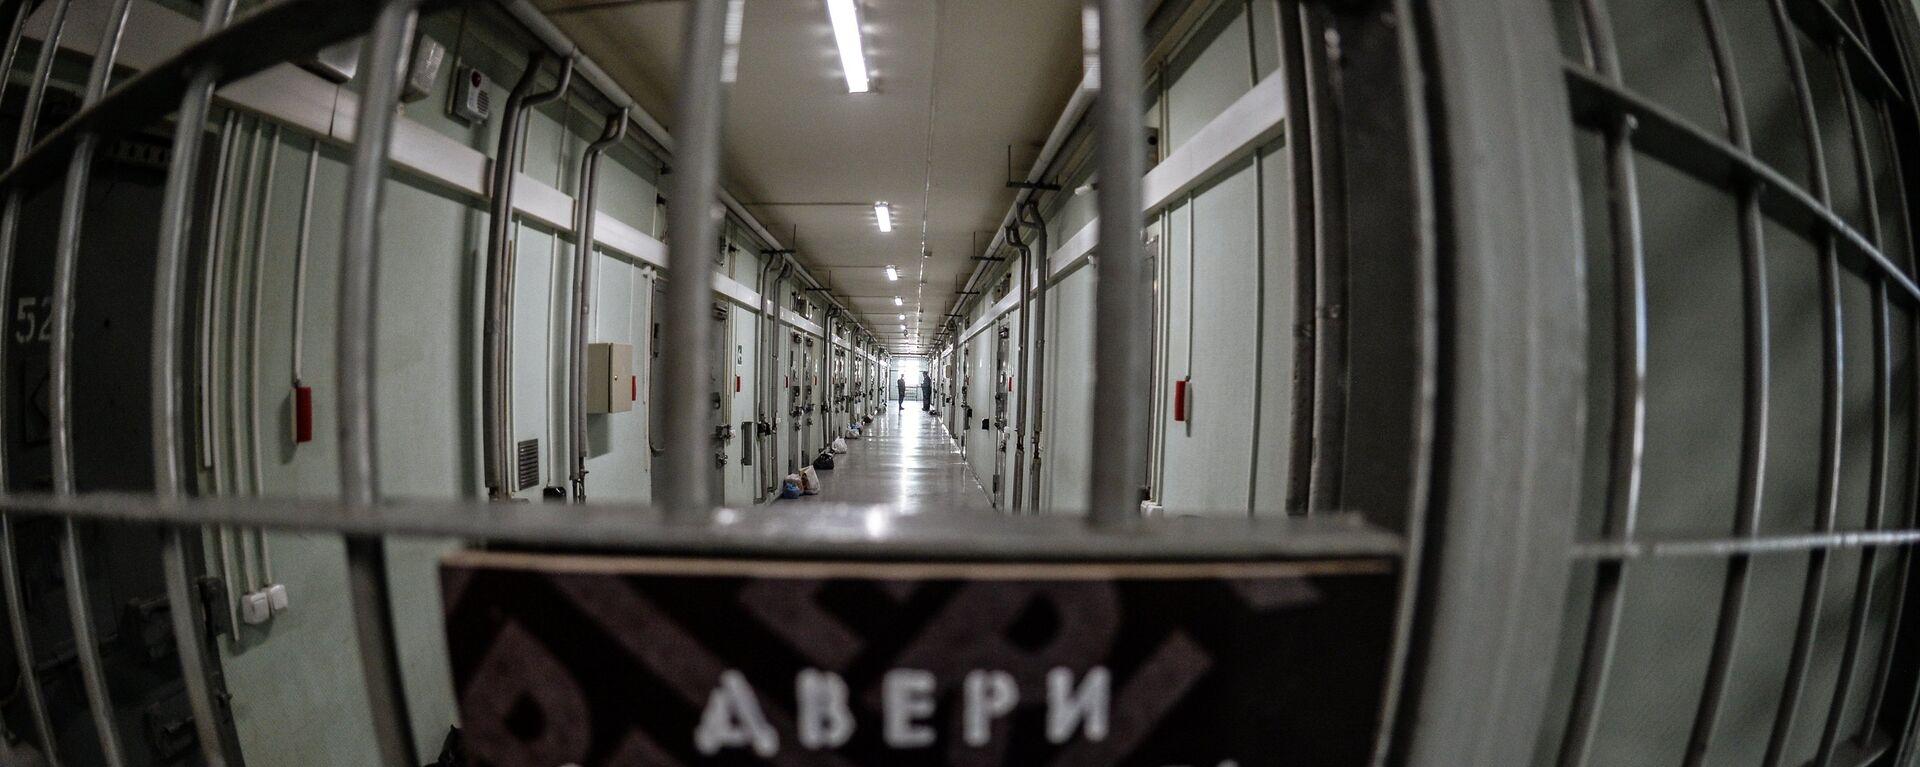 Коридор в тюрьме - Sputnik Беларусь, 1920, 11.09.2019